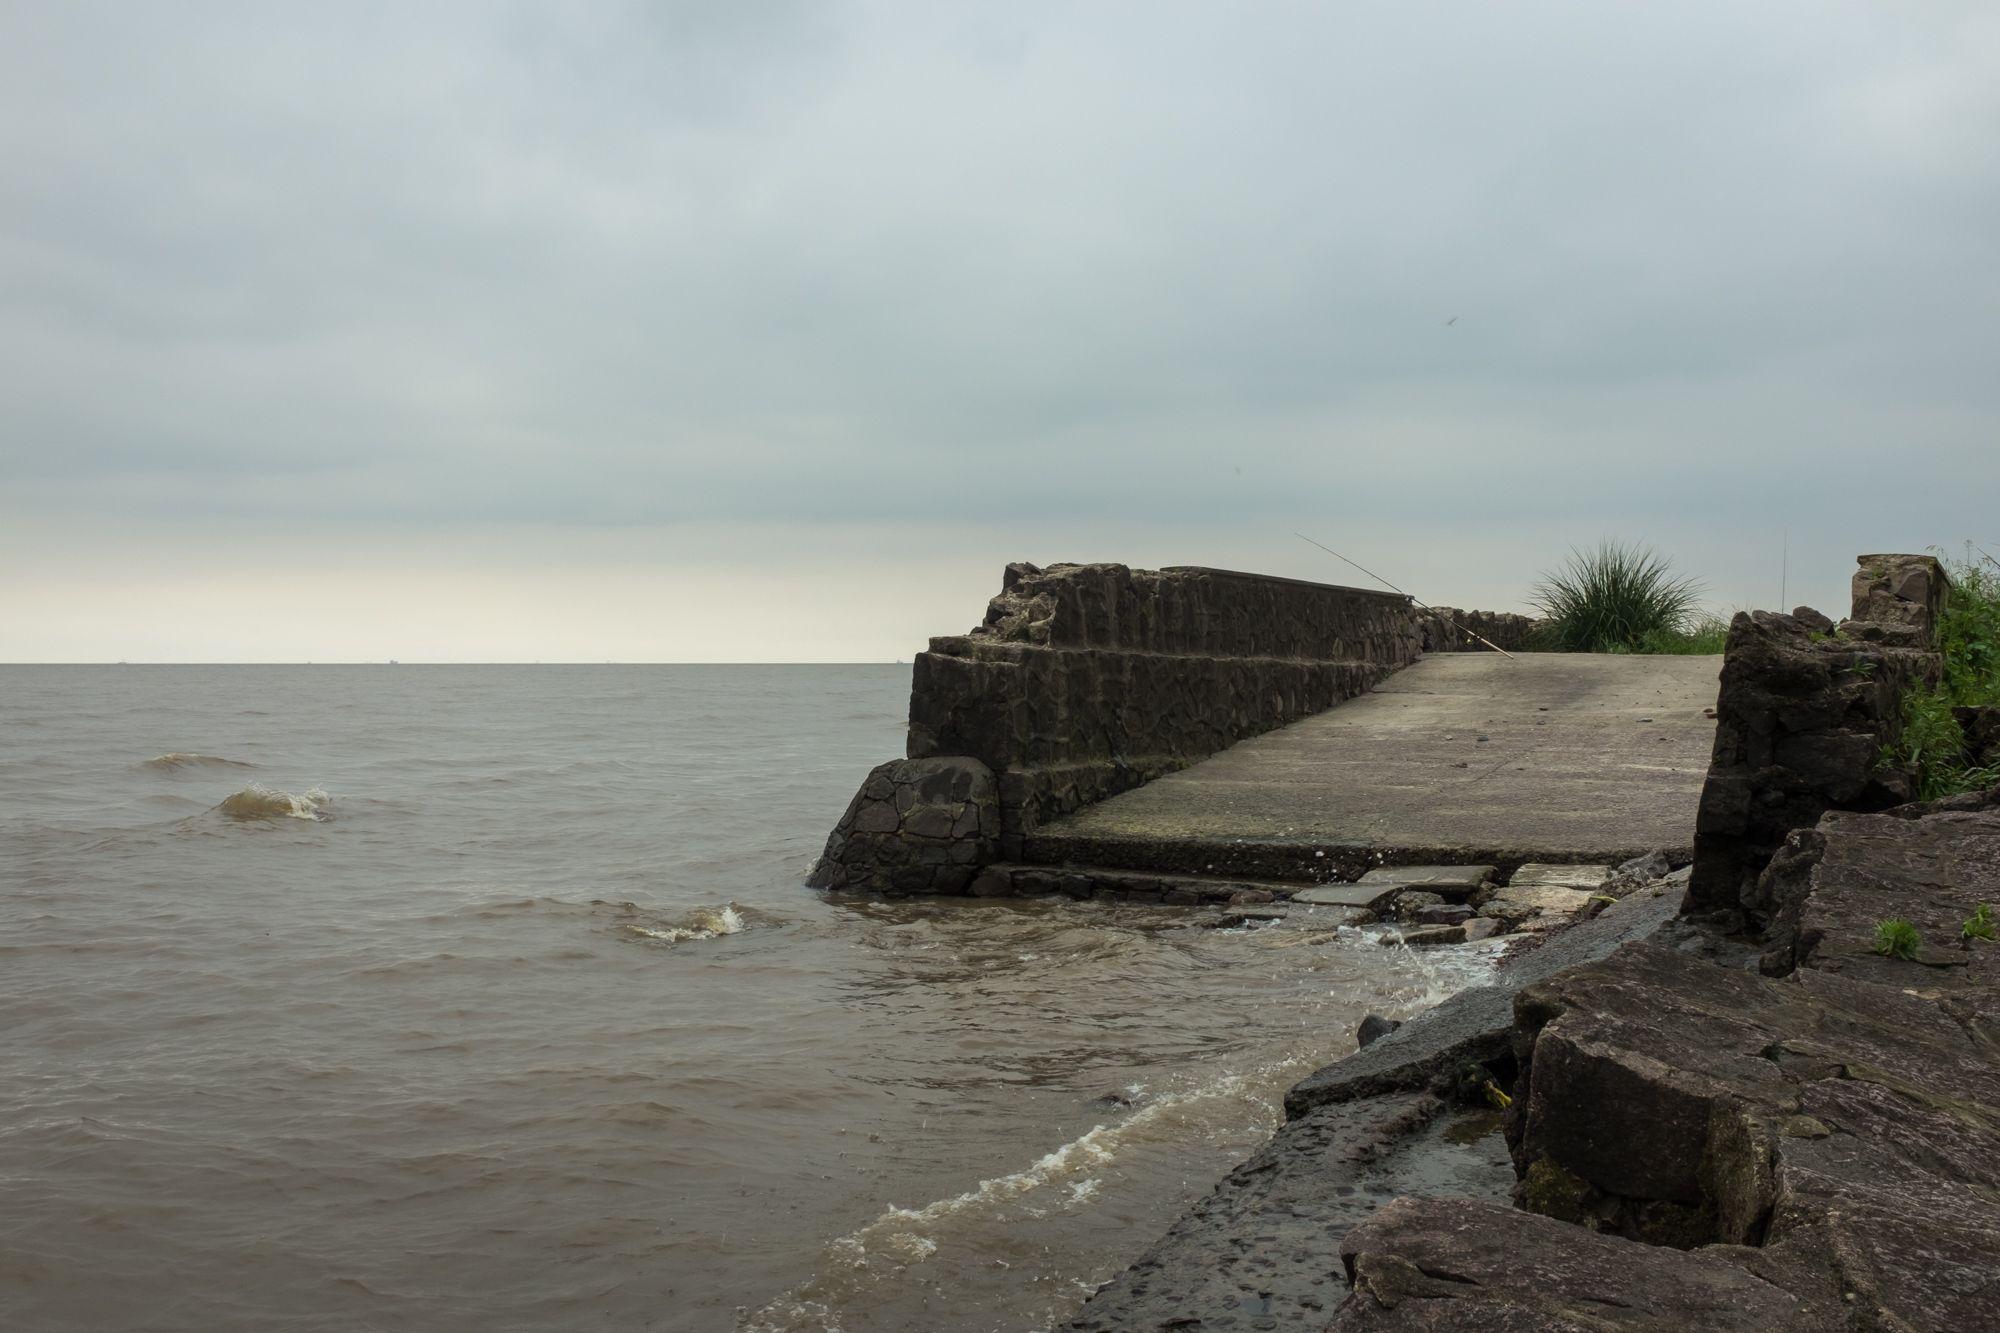 Ribera del Río de la Plata - Punta Lara #02